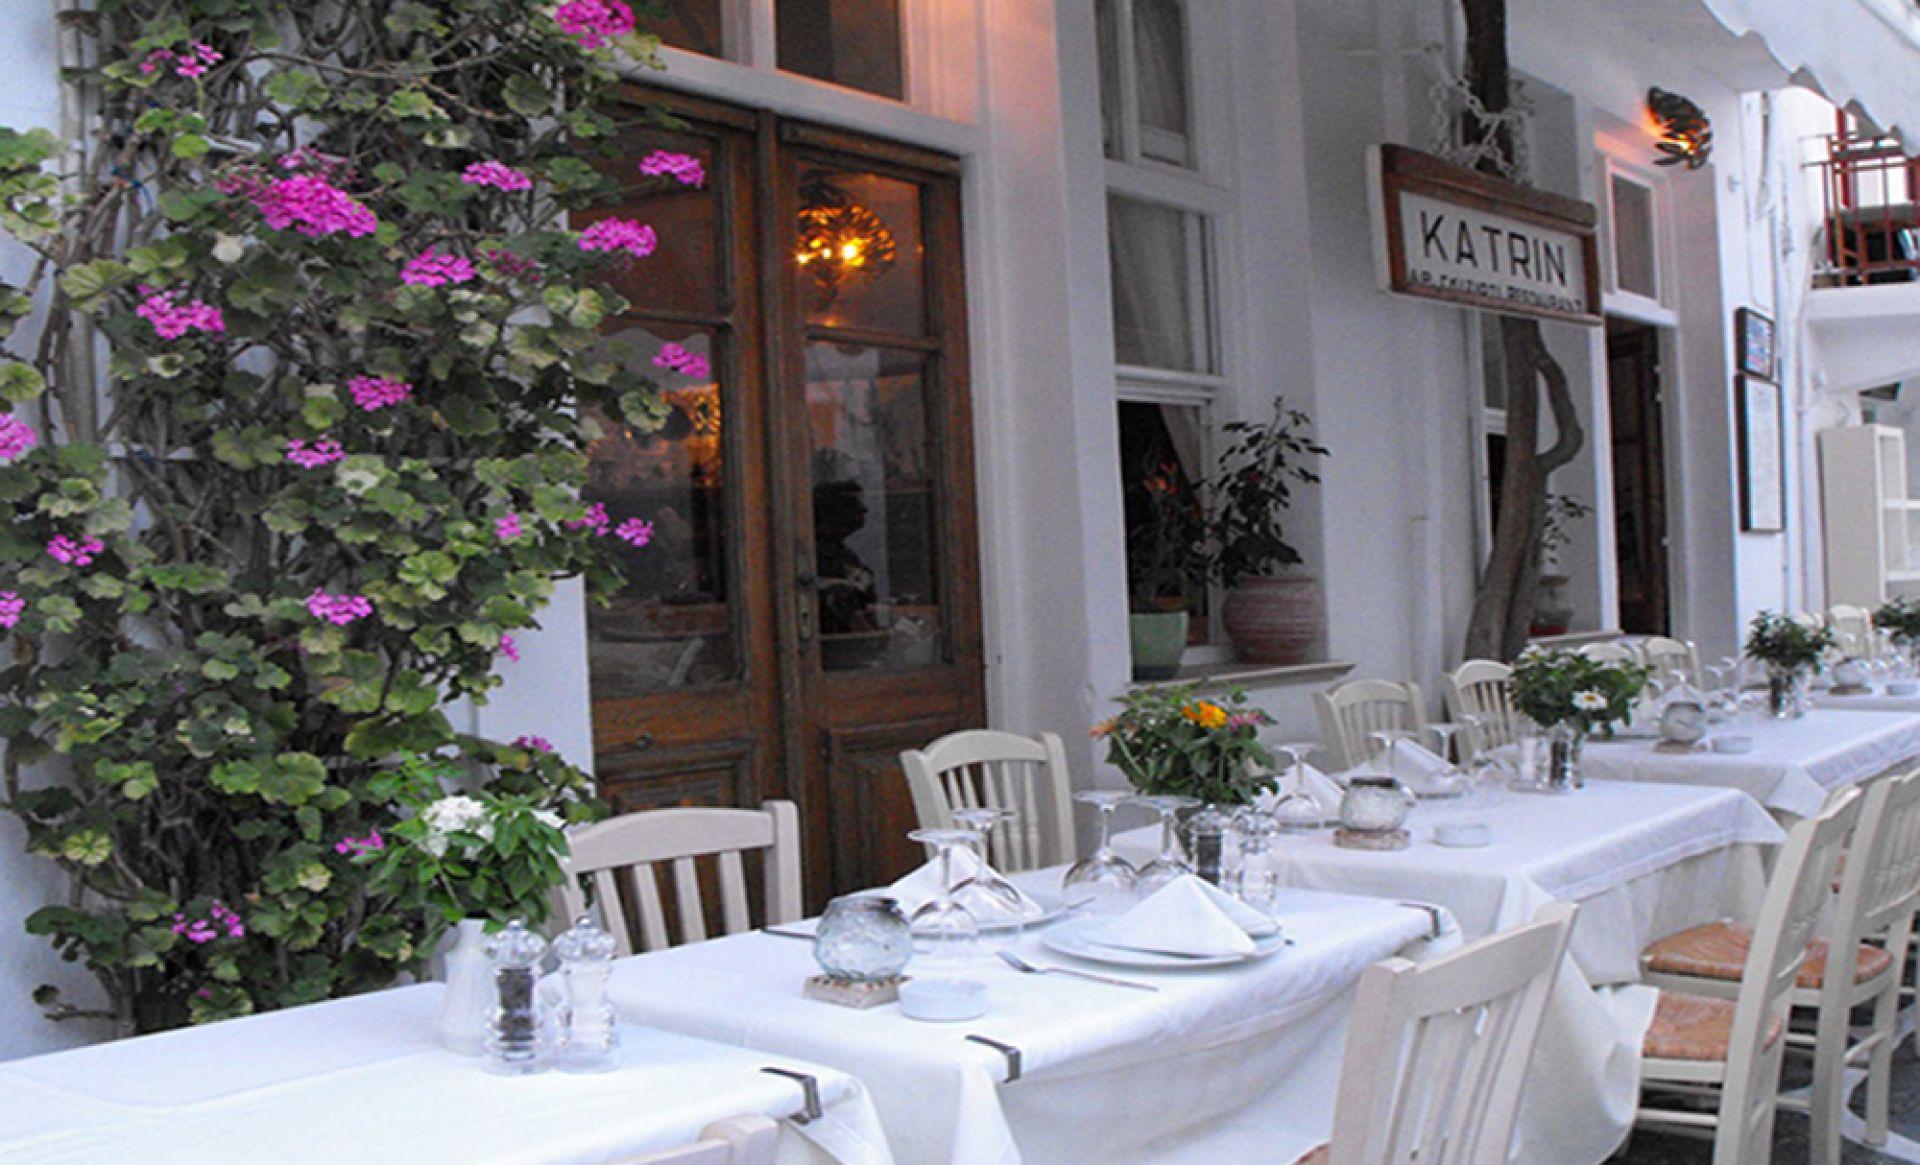 La Maison De Catherine - Dinner Venue In Mykonos destiné La Maison De Catherine